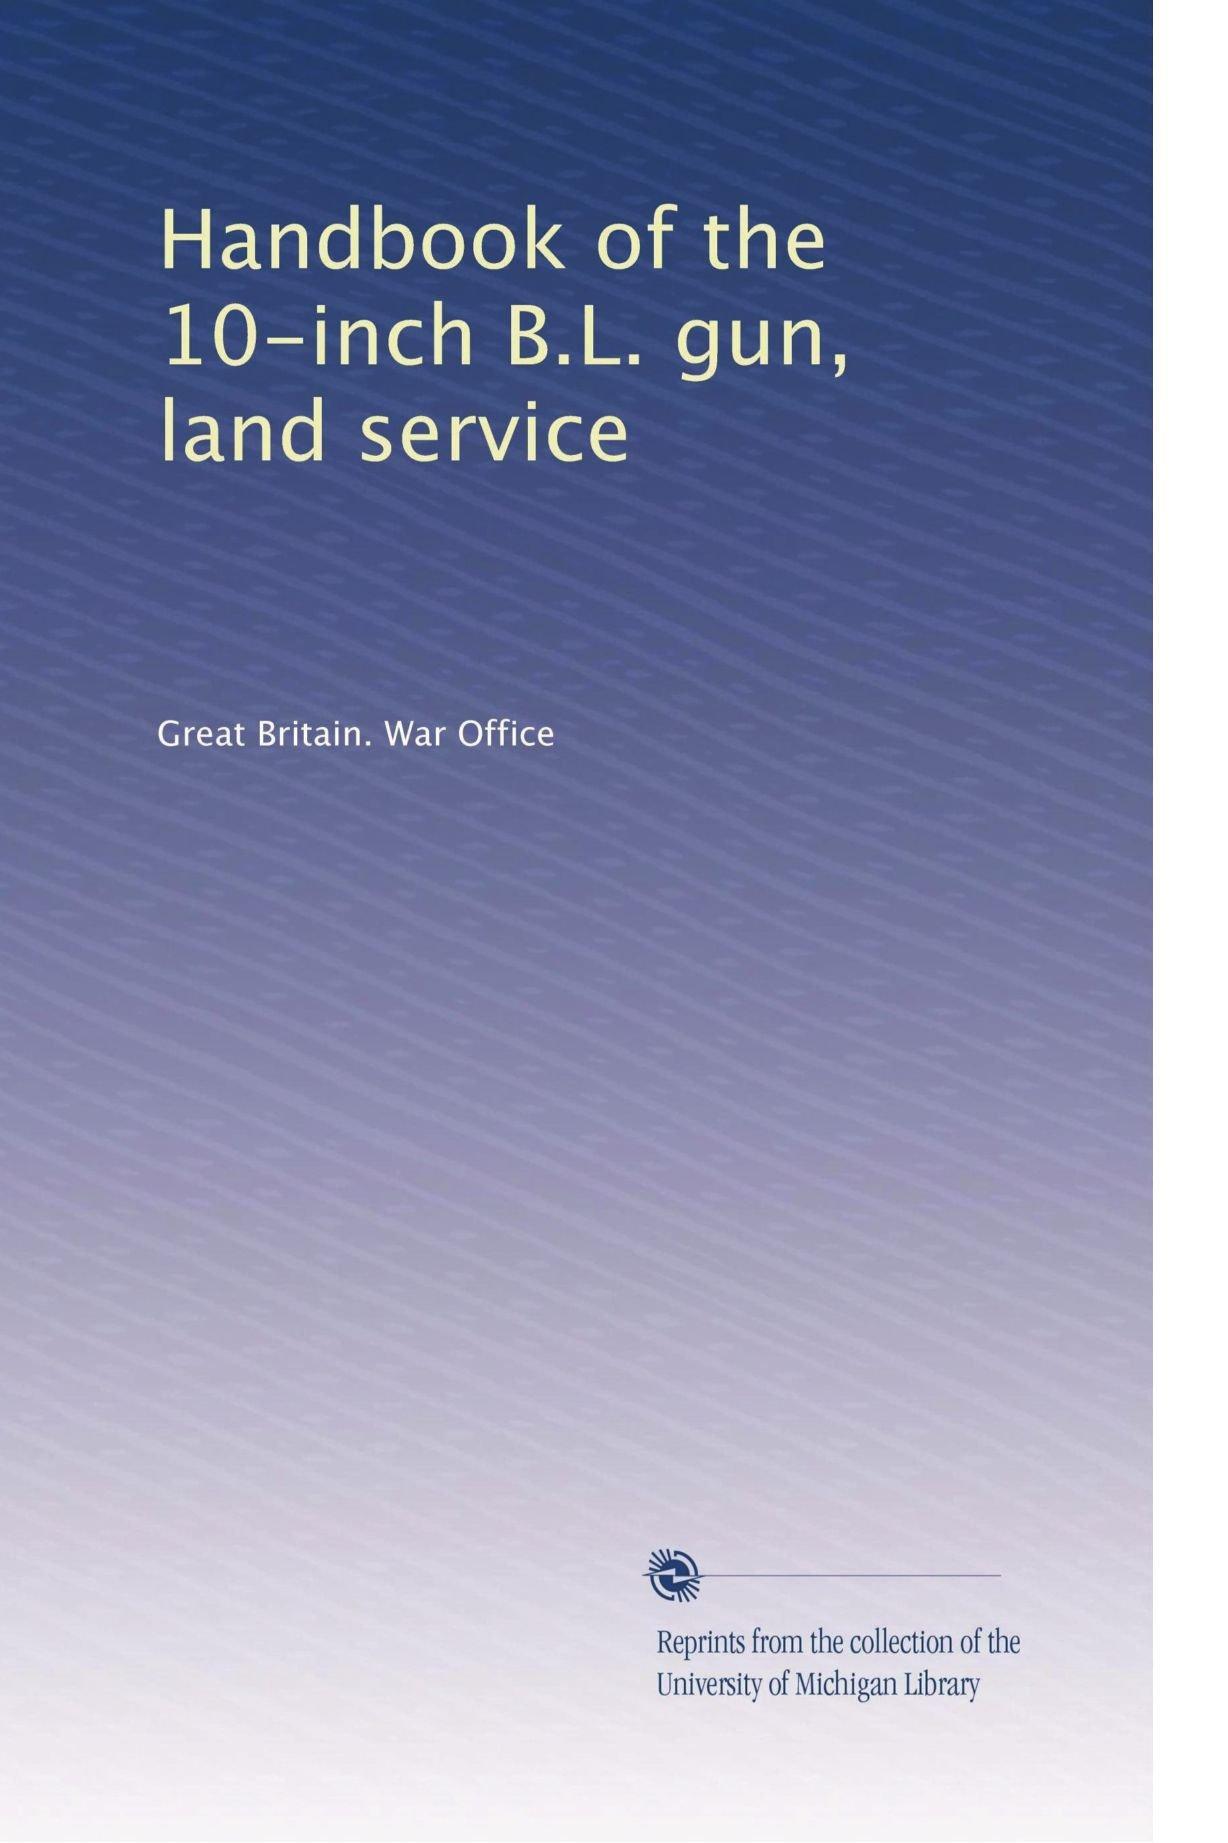 Handbook of the 10-inch B.L. gun, land service: Great Britain. War Office:  Amazon.com: Books